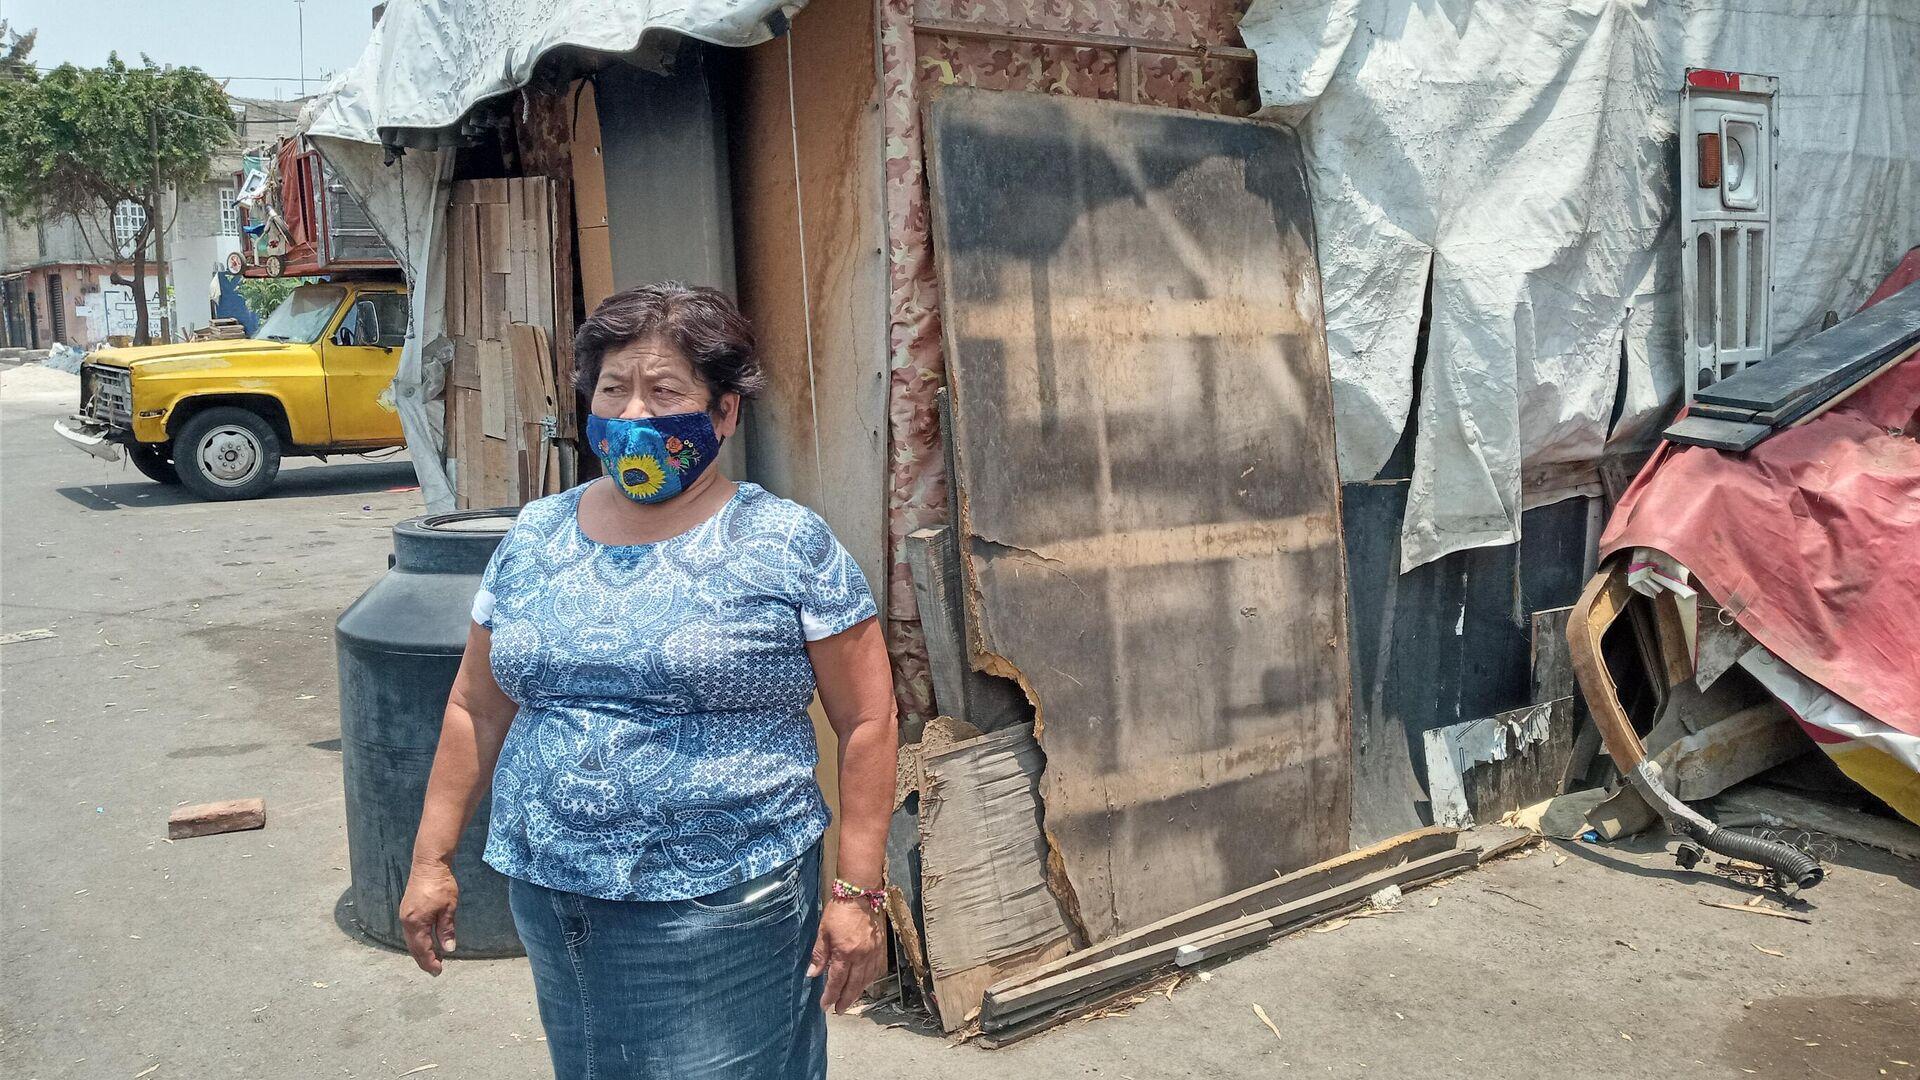 Luisa Aguirre damnificada del sismo de 2017 posa para foto, sigue sin poder volver a casa - Sputnik Mundo, 1920, 19.09.2021